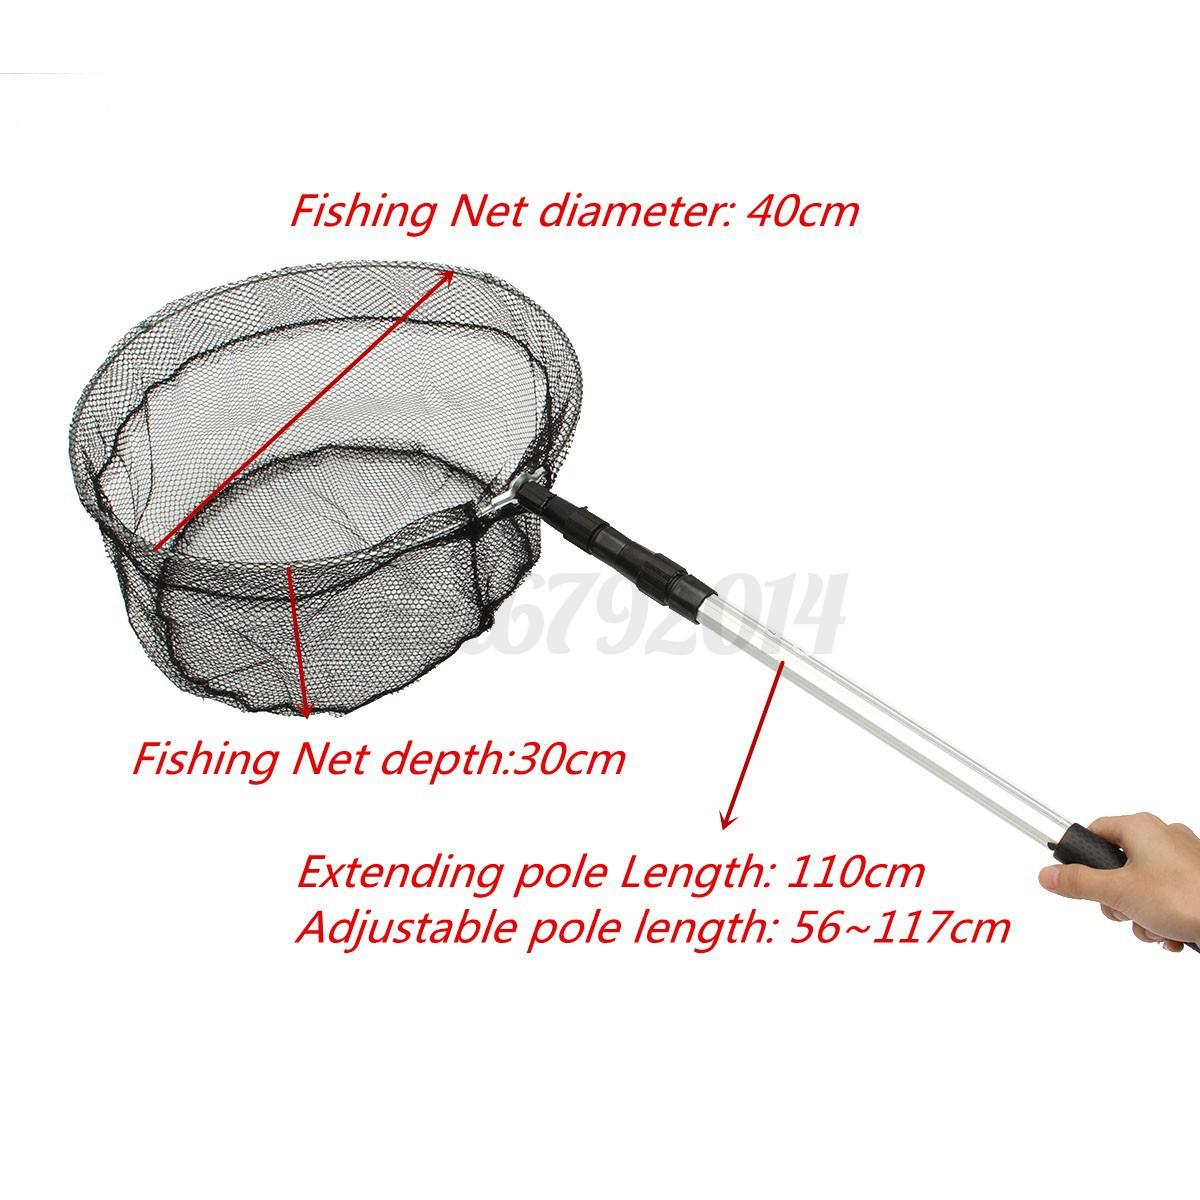 Telescopic folding fishing landing net extending tele pole for Fishing landing net